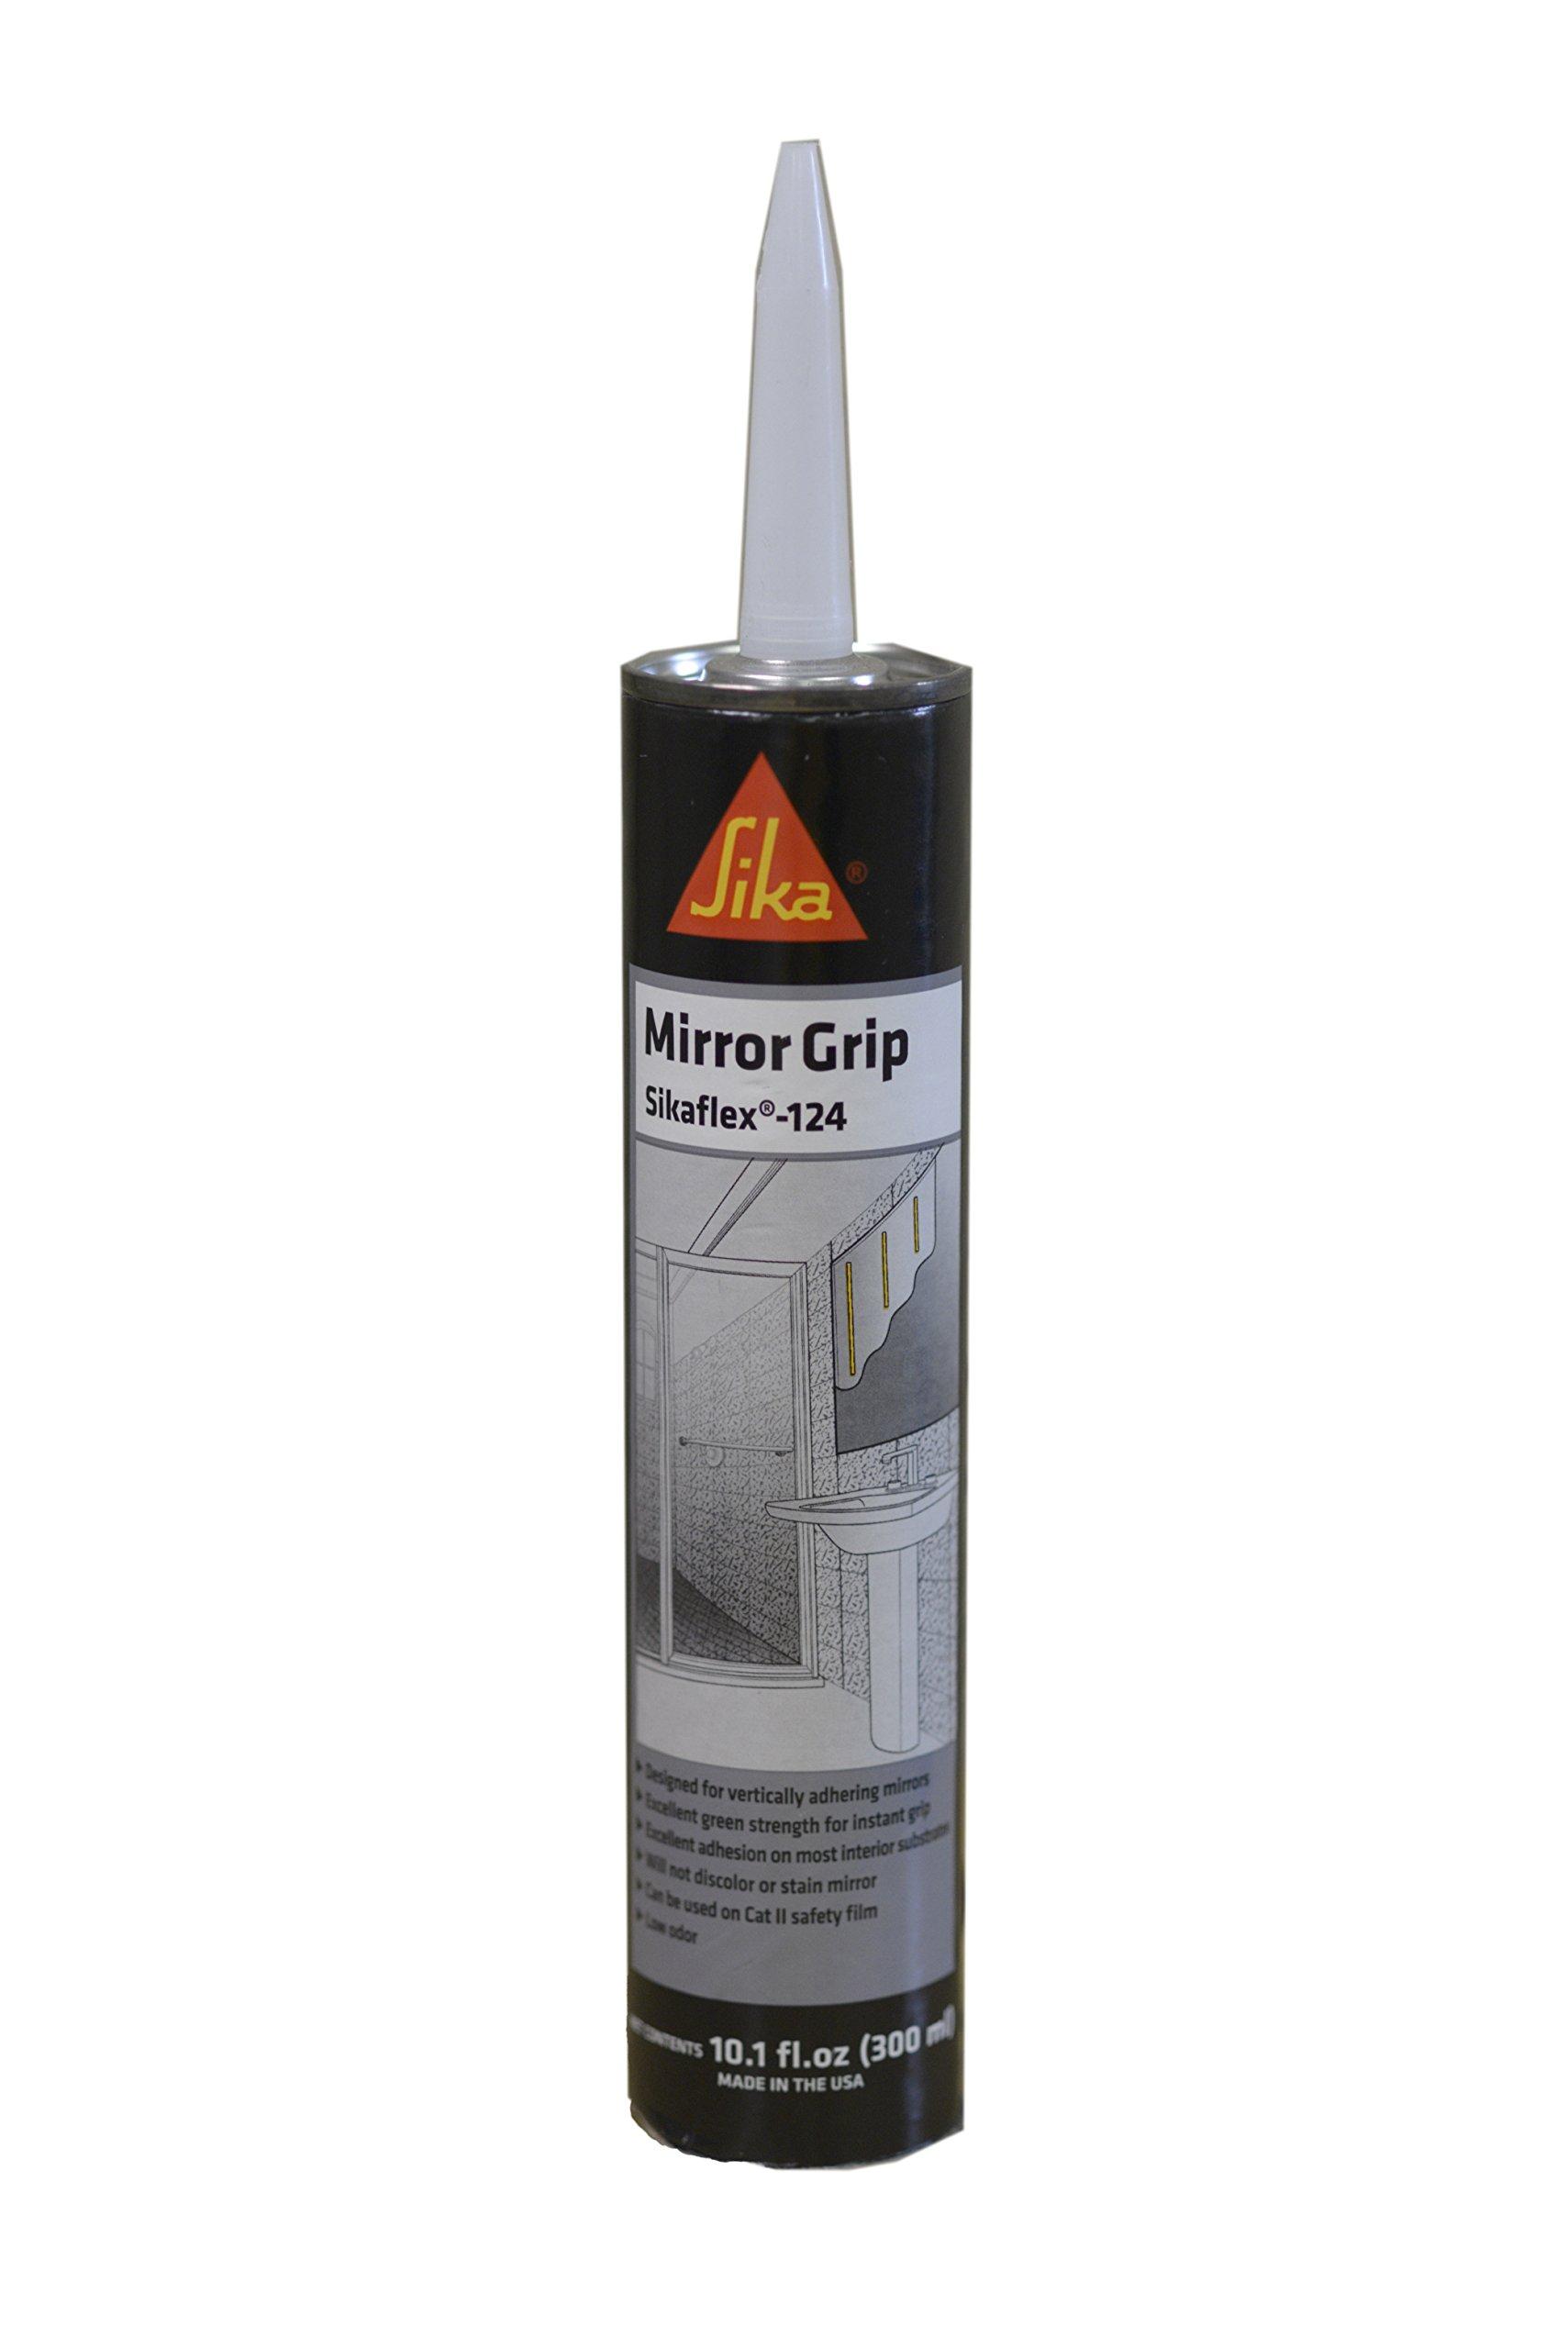 Sikaflex-124 Mirror Grip Gray Polyurethane Adhesive 10.1 fl. oz. Cartridge